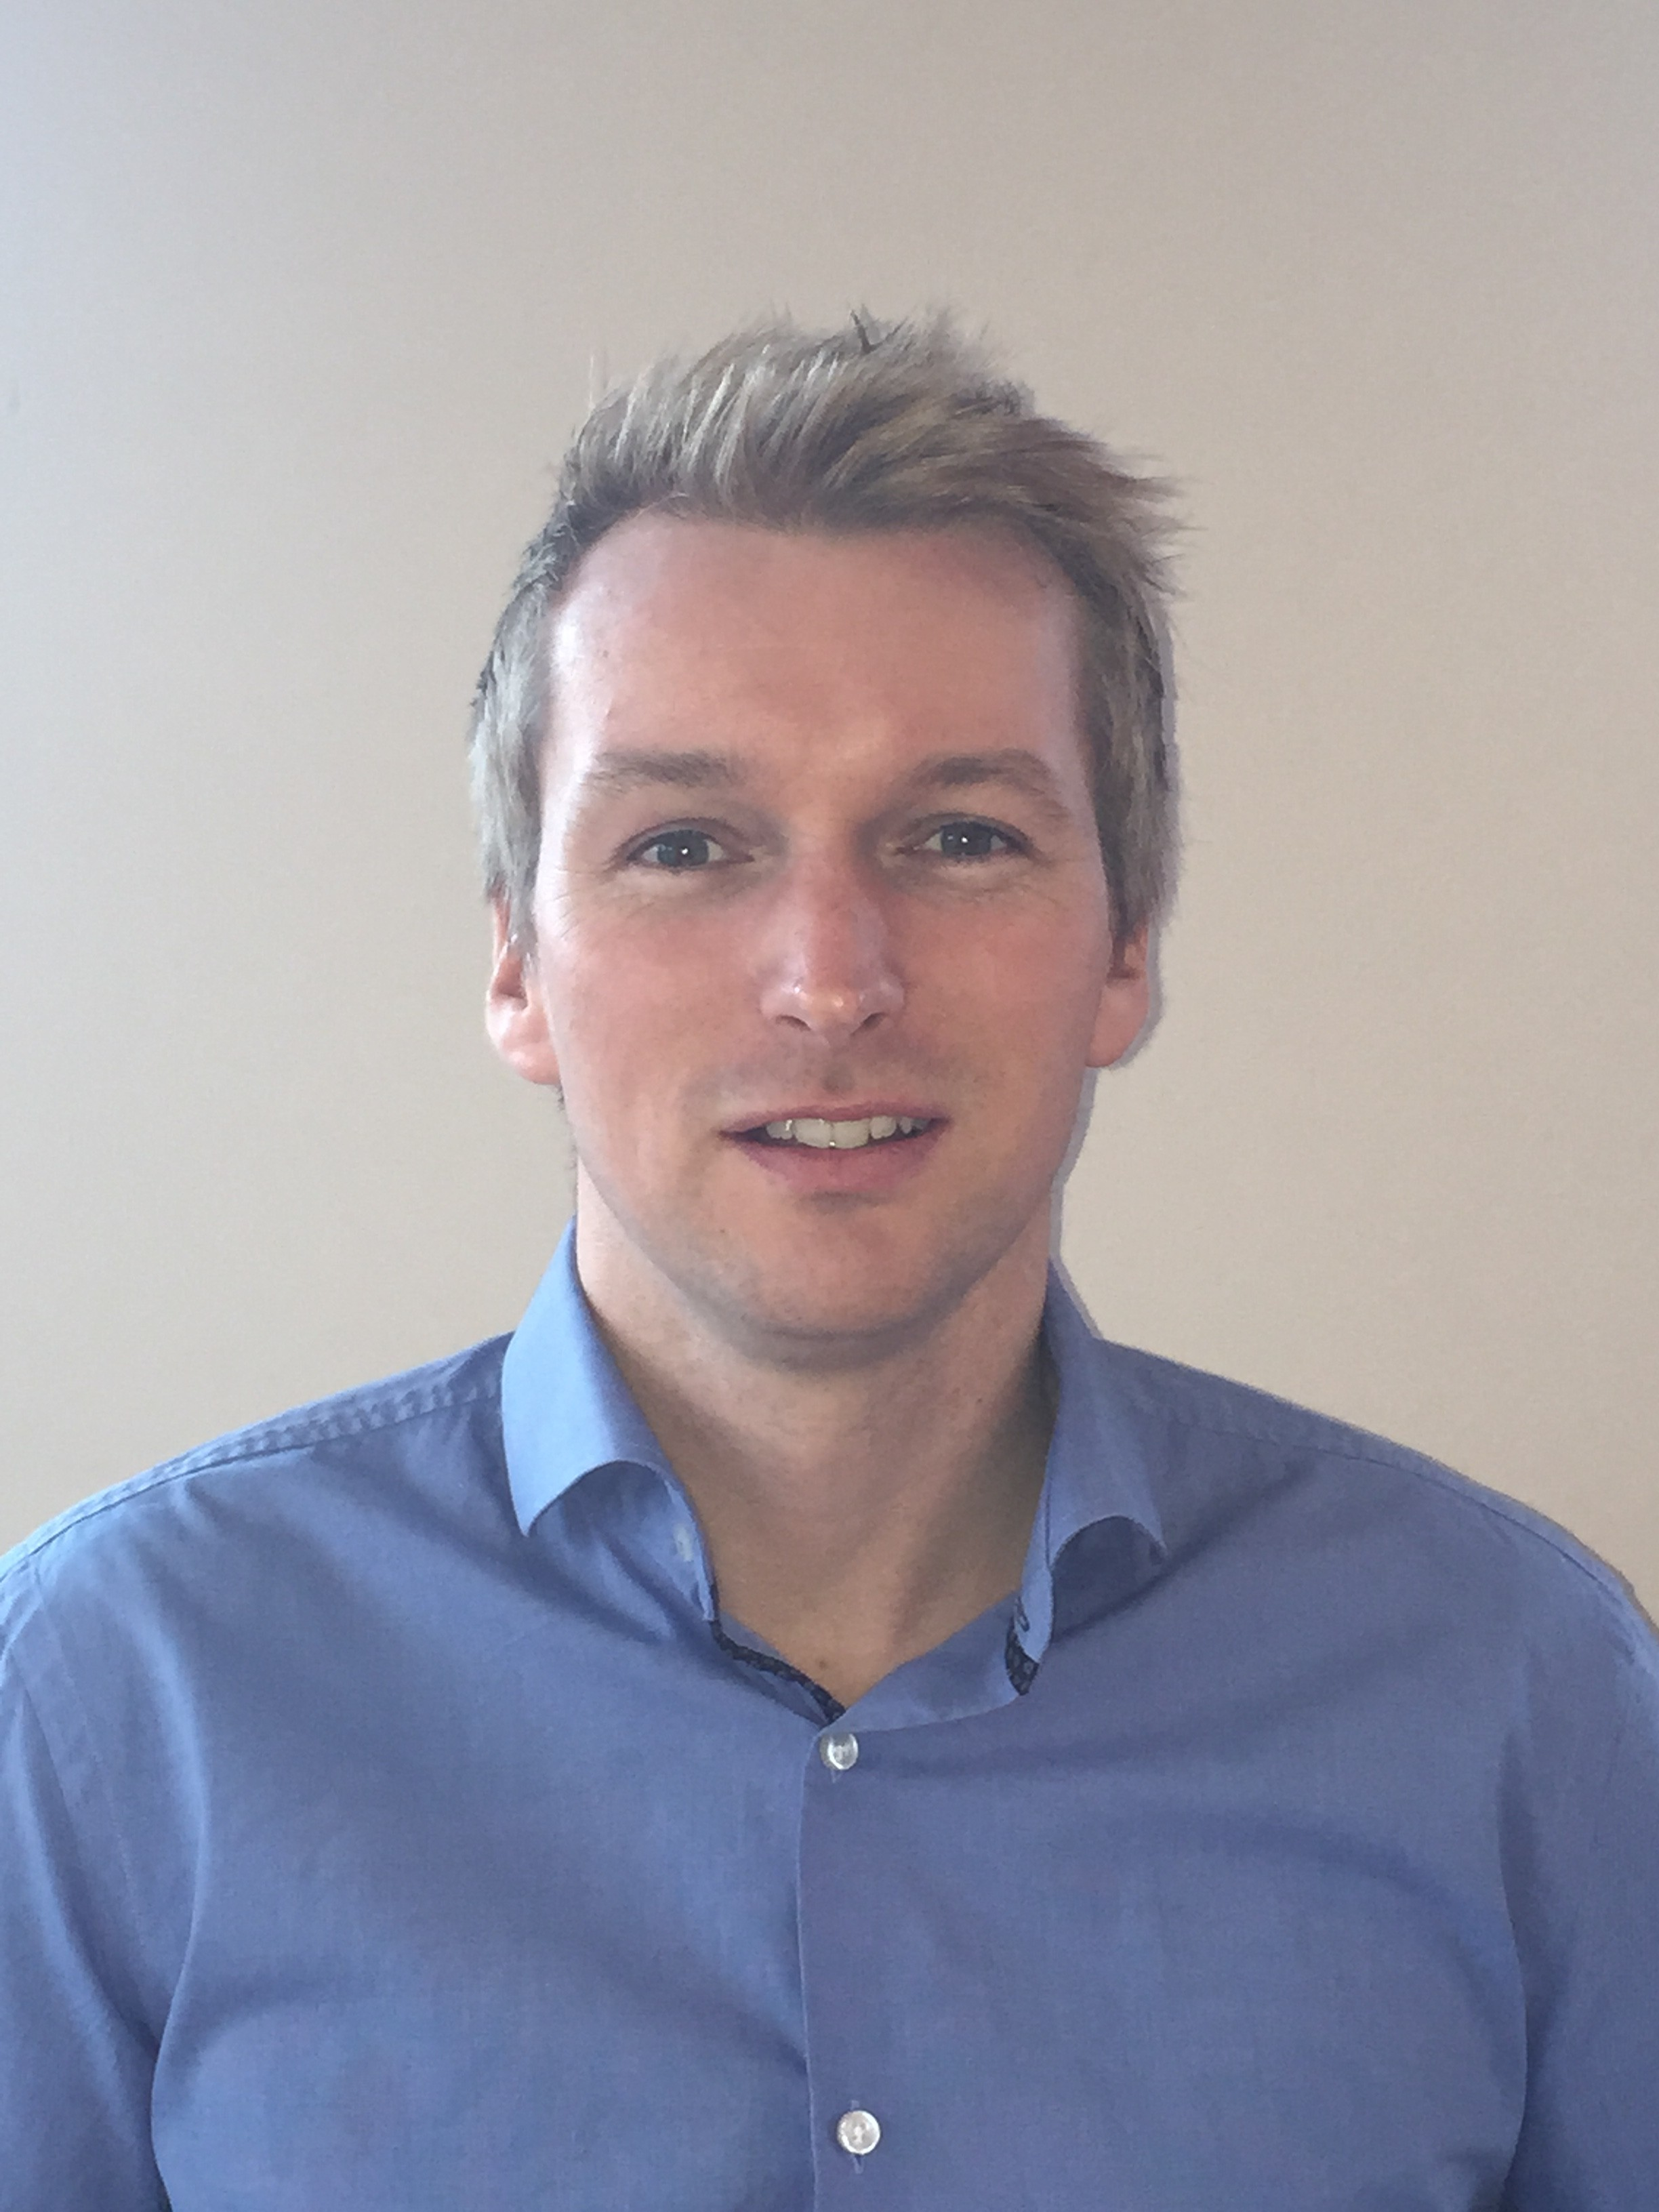 Operations Director Ben Wilson described Jamie Kerr as one of their brightest